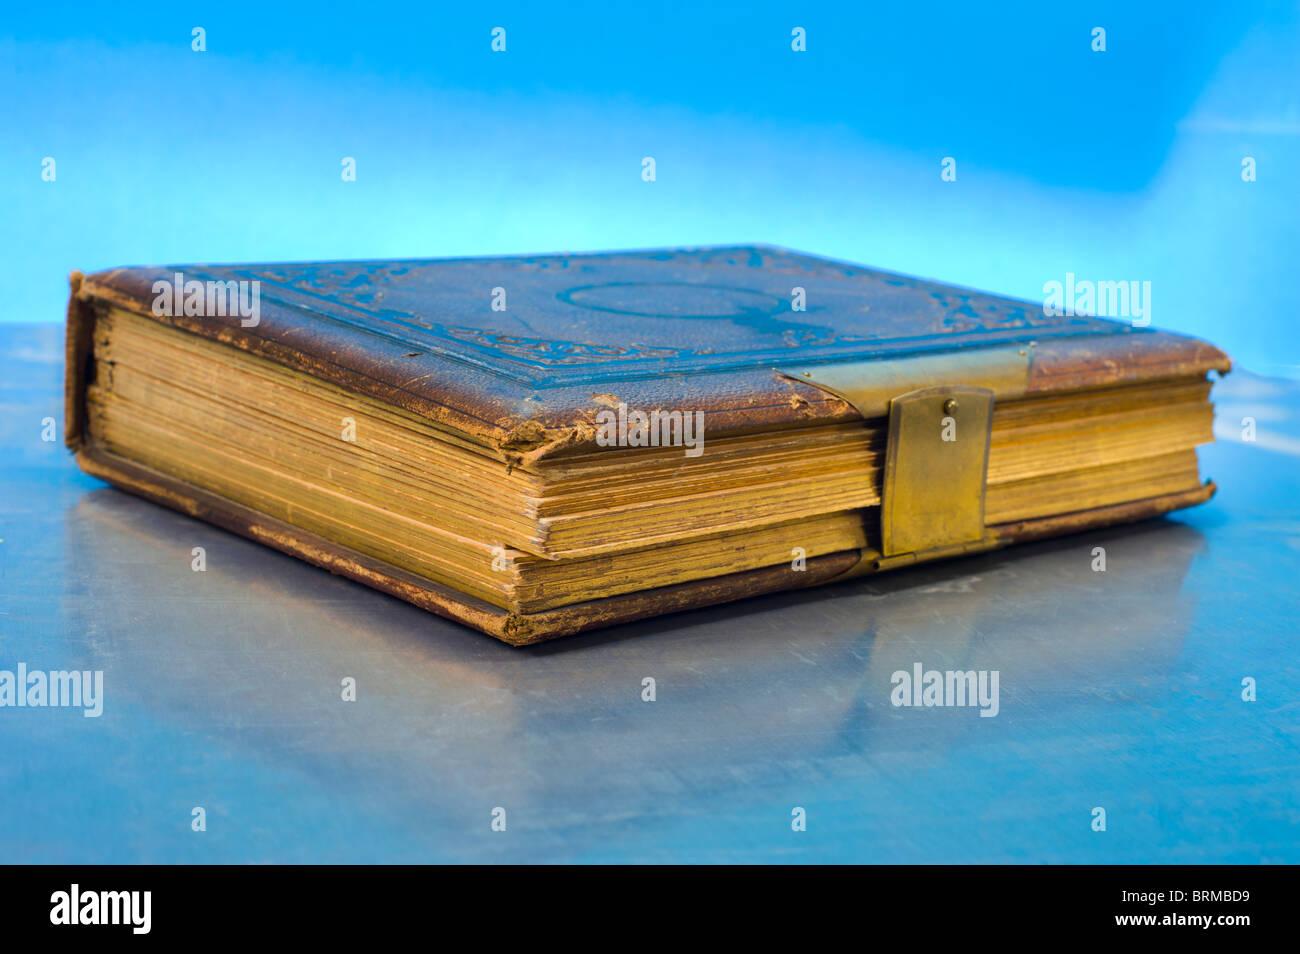 big old book symbol symbolic blue background gold golden ancient bible diary  studio shot bright antique antiquariat - Stock Image